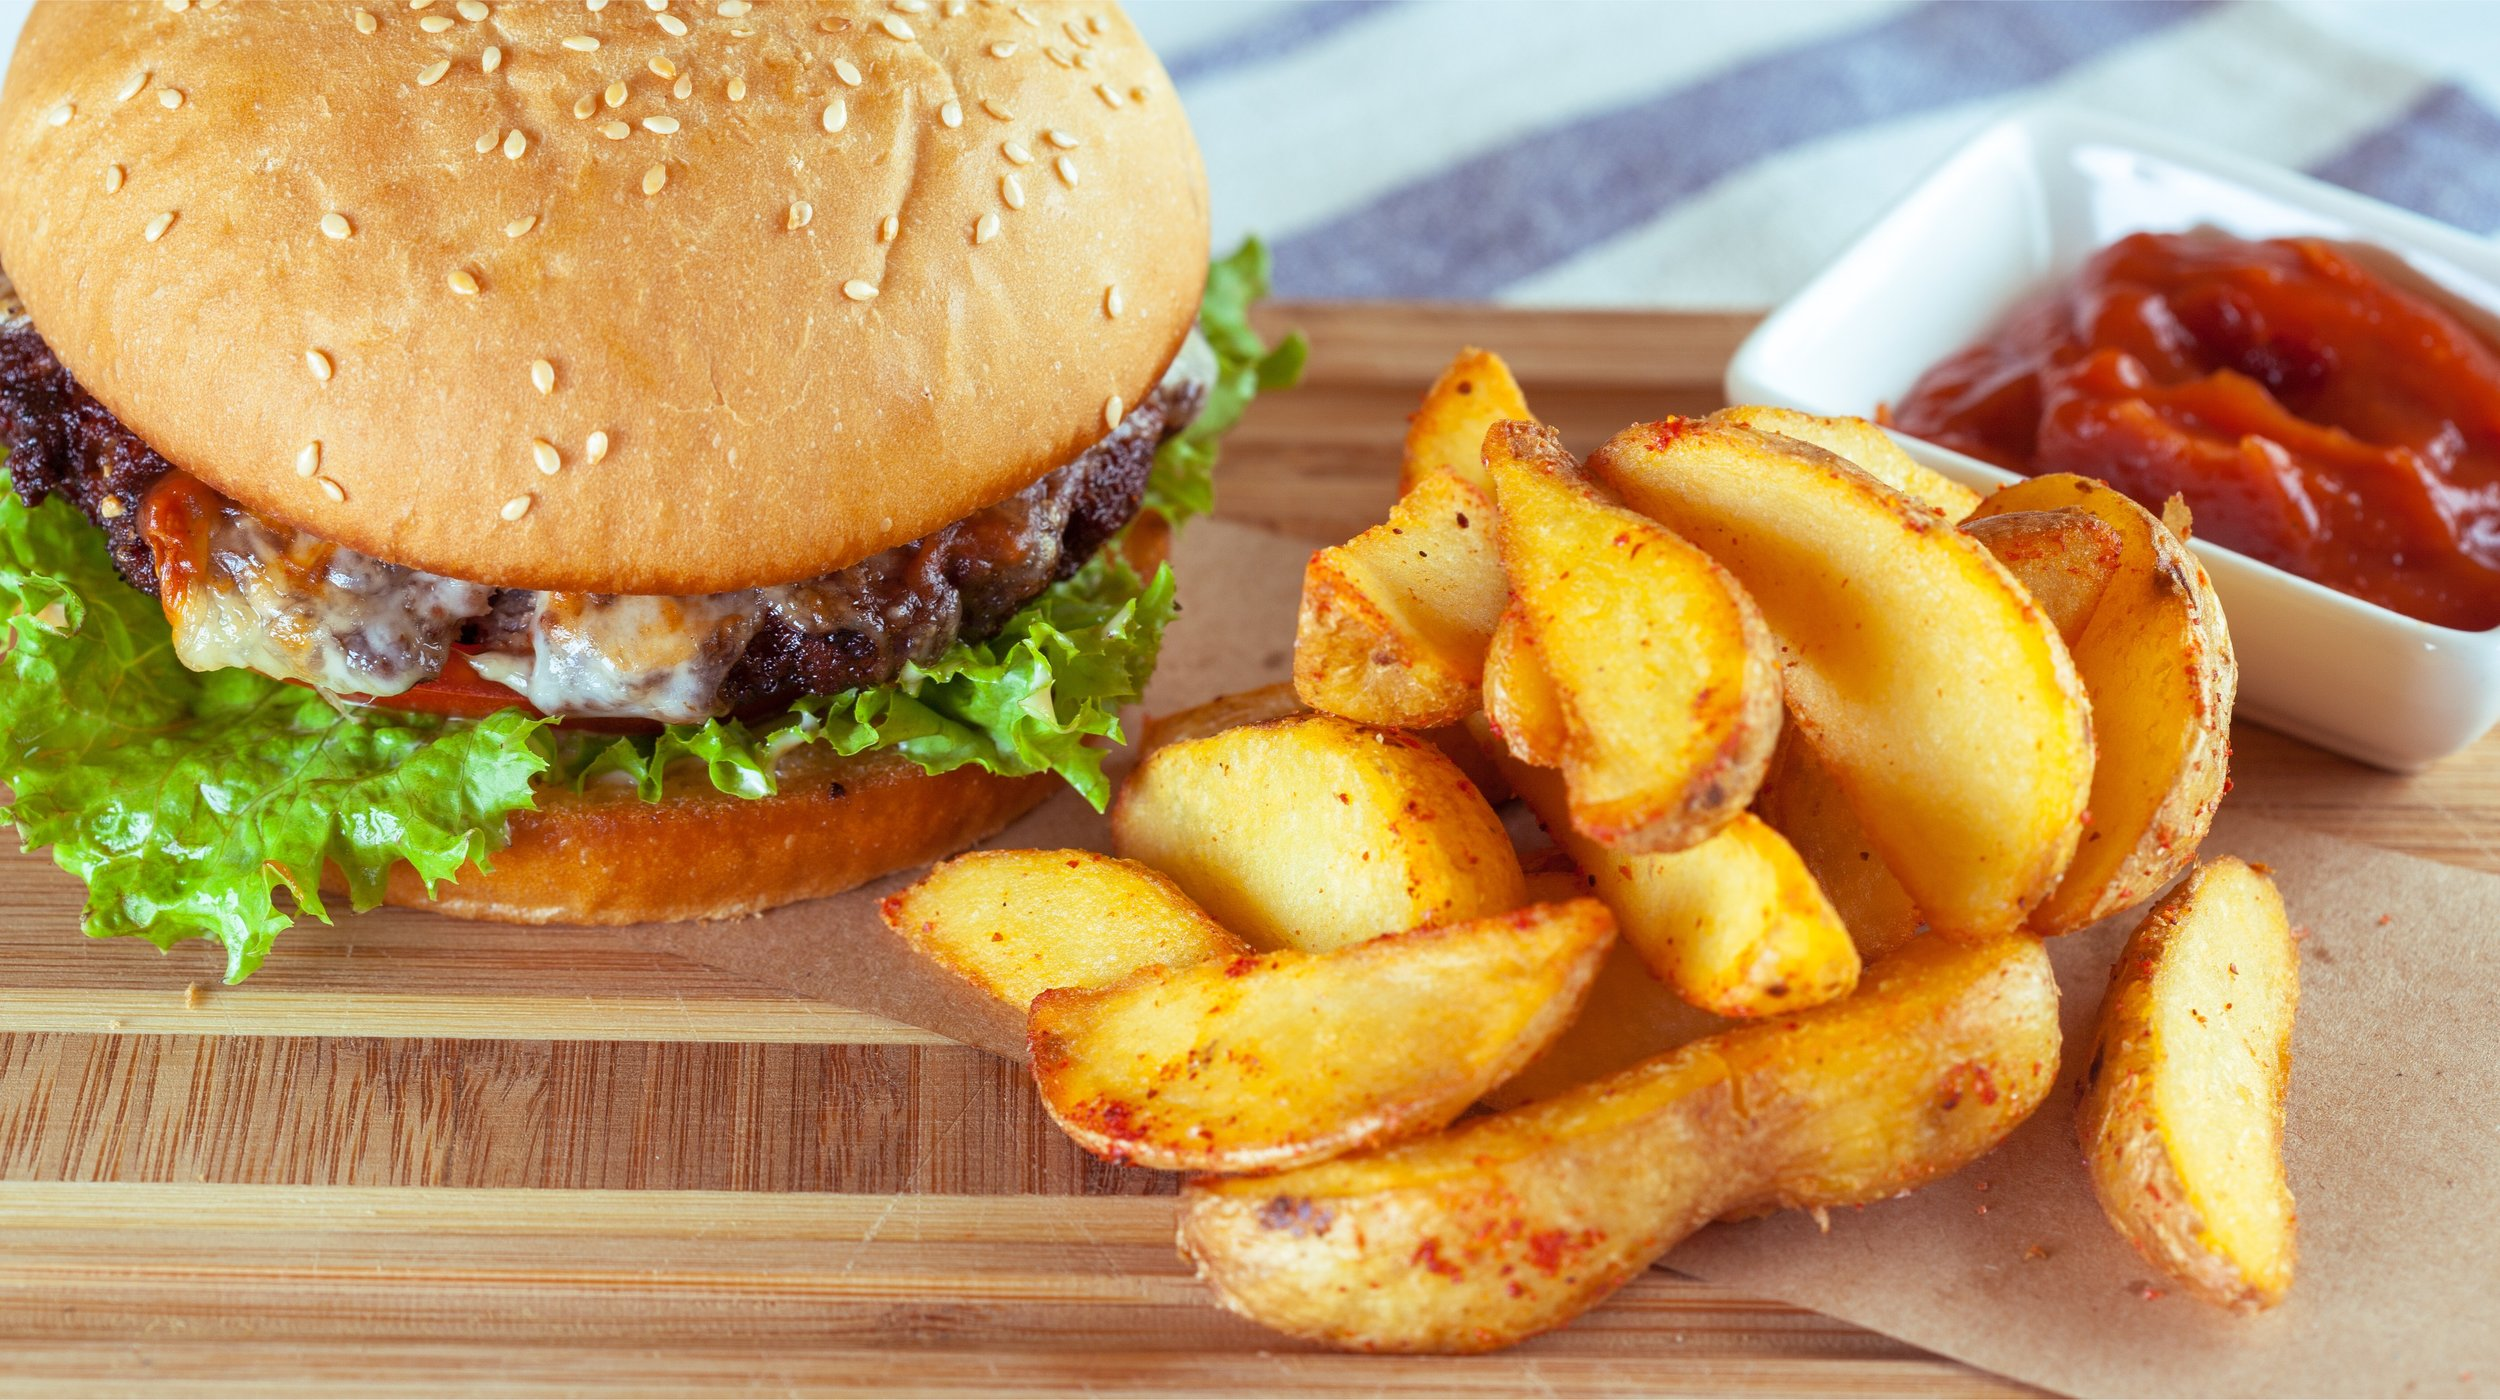 burger_fries.jpg